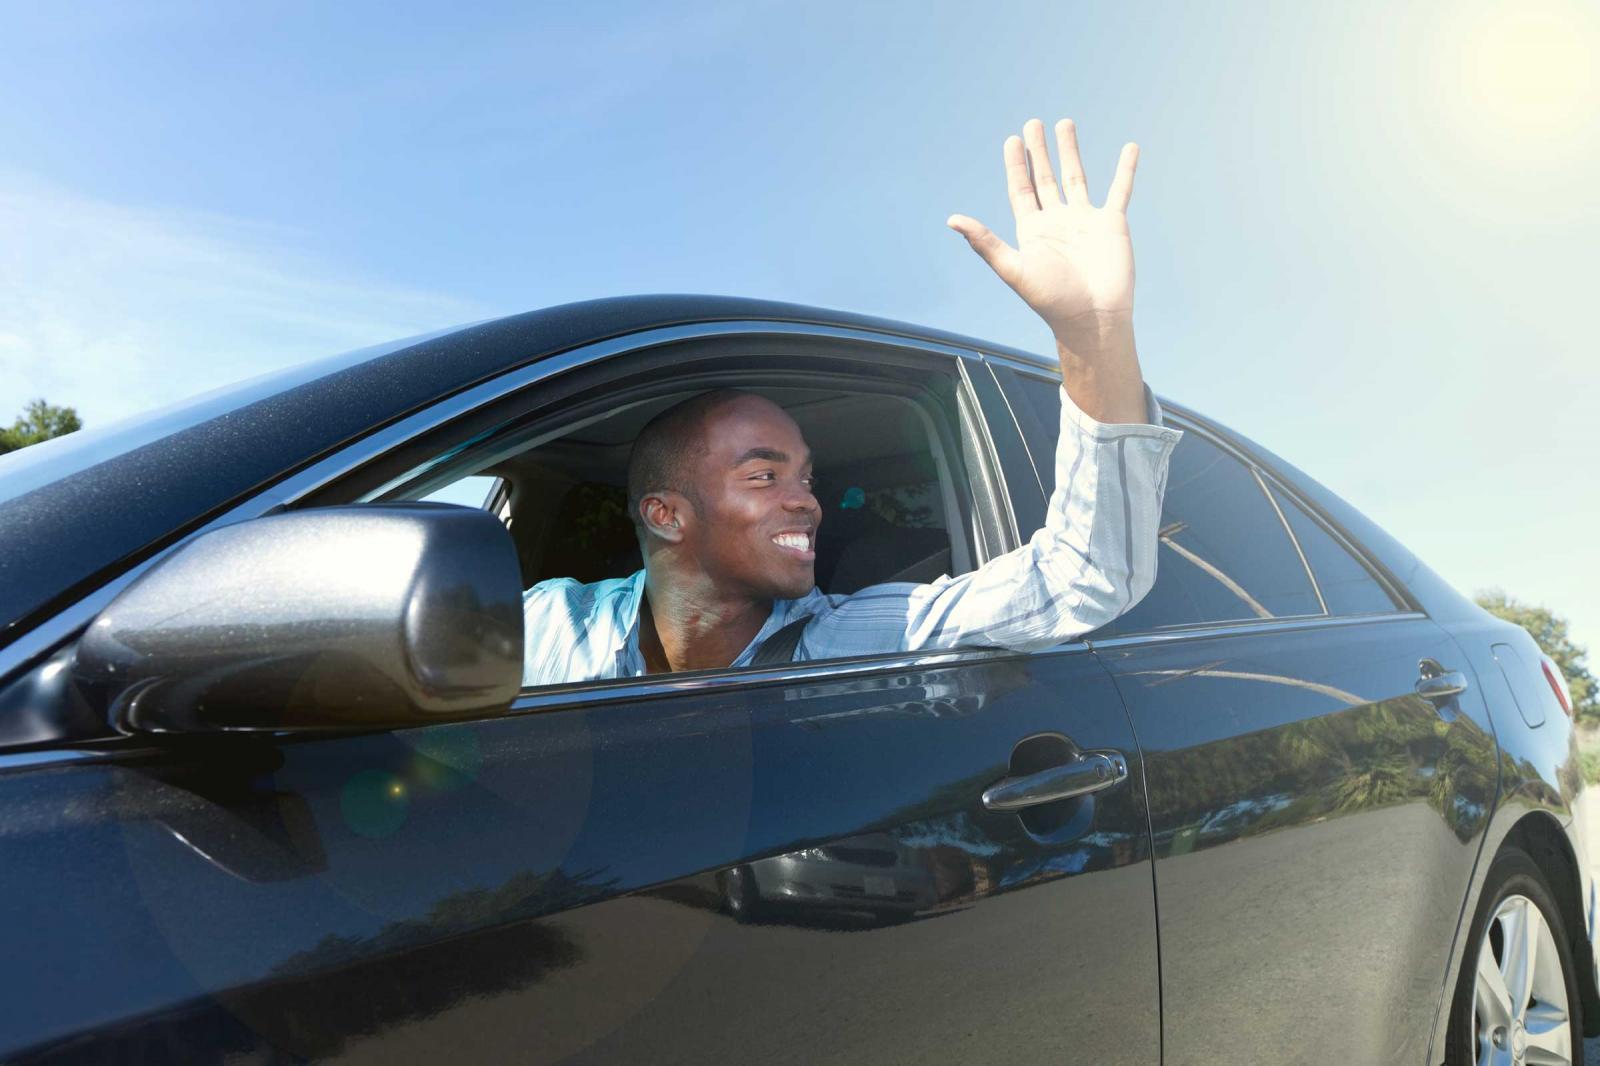 a black man inside a car with a window down